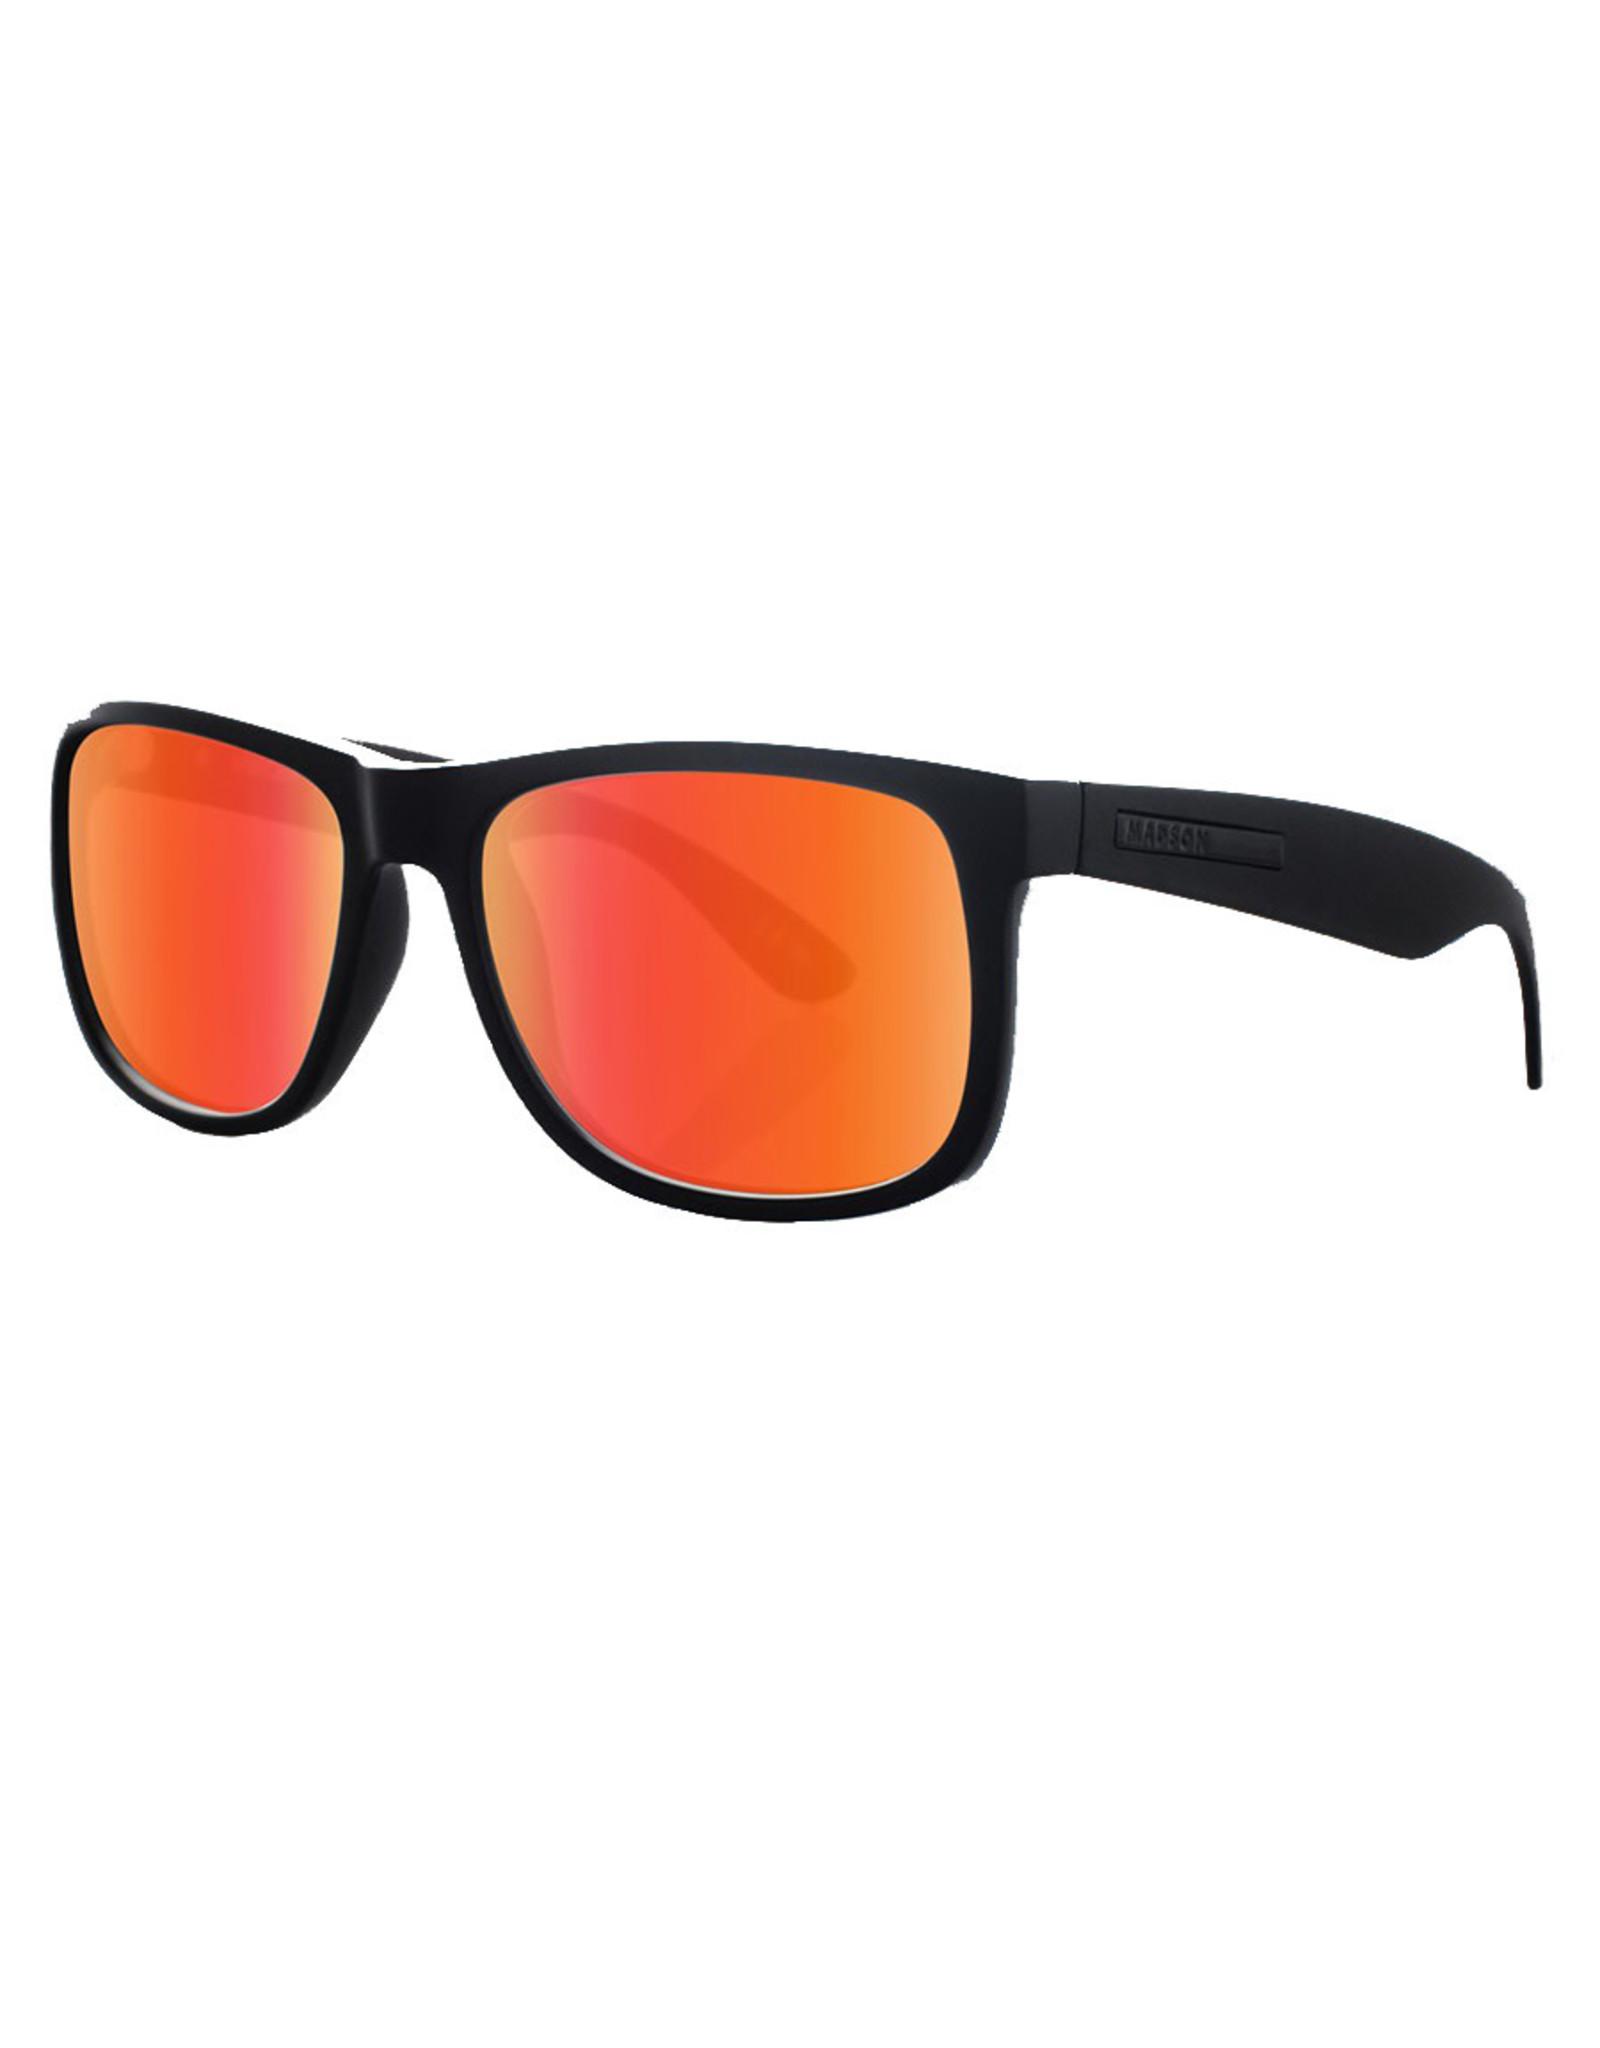 Madson Madson Sunglasses Vincent (Black On Black/Red Chrome Polarized Lens)